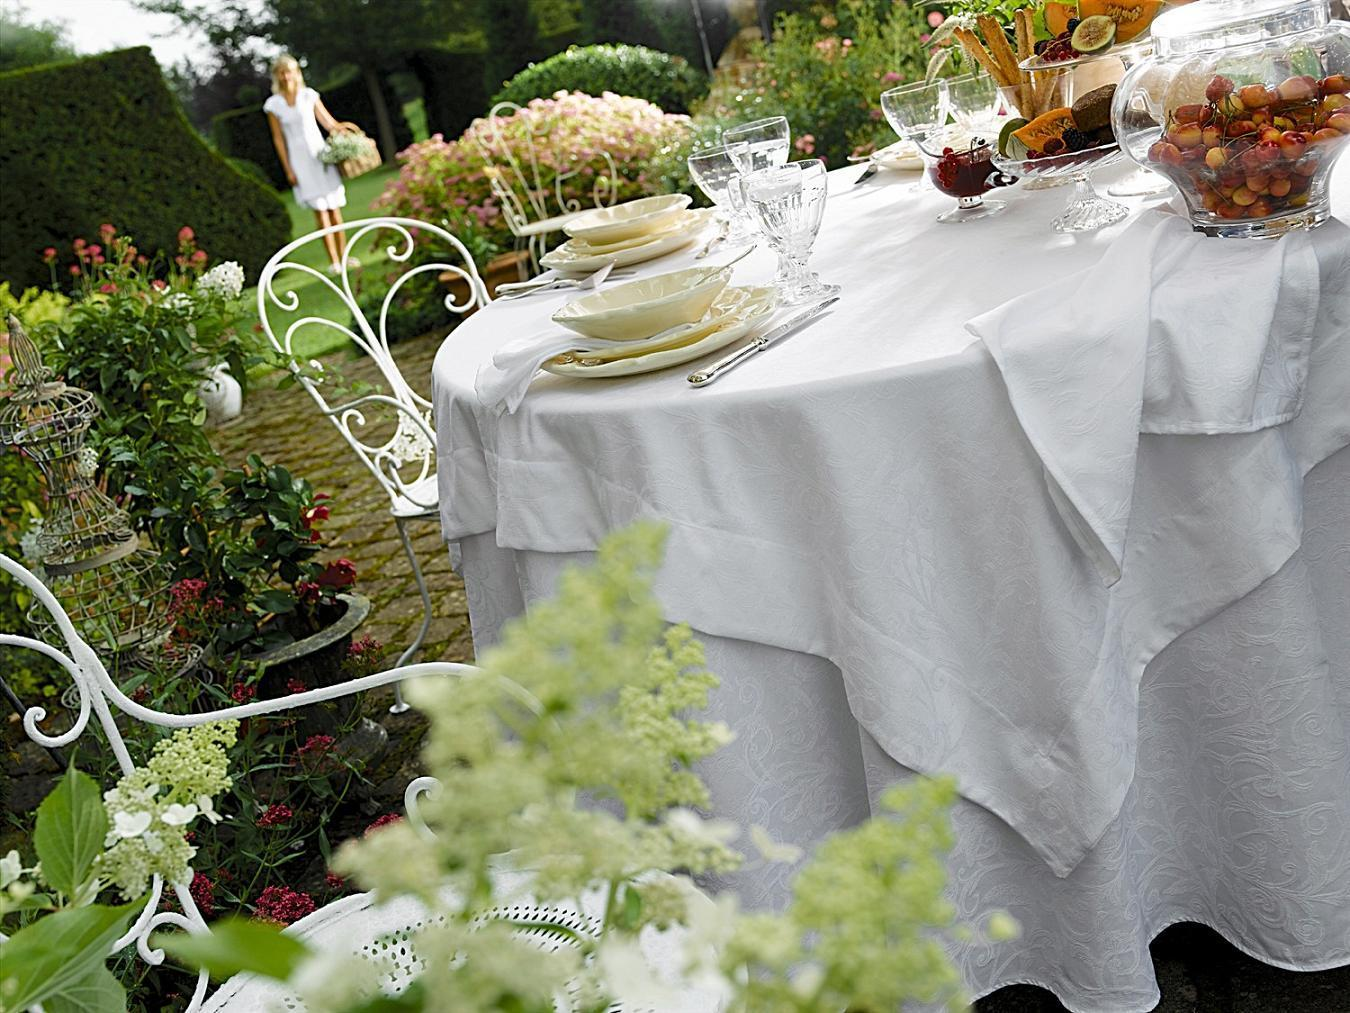 Кухня Скатерть 170x240 и 8 салфеток Blanc des Vosges Ombelle белая skatert-i-komplekt-salfetok-blanc-des-vosges-ombelle-belaya-frantsiya-vid.jpg